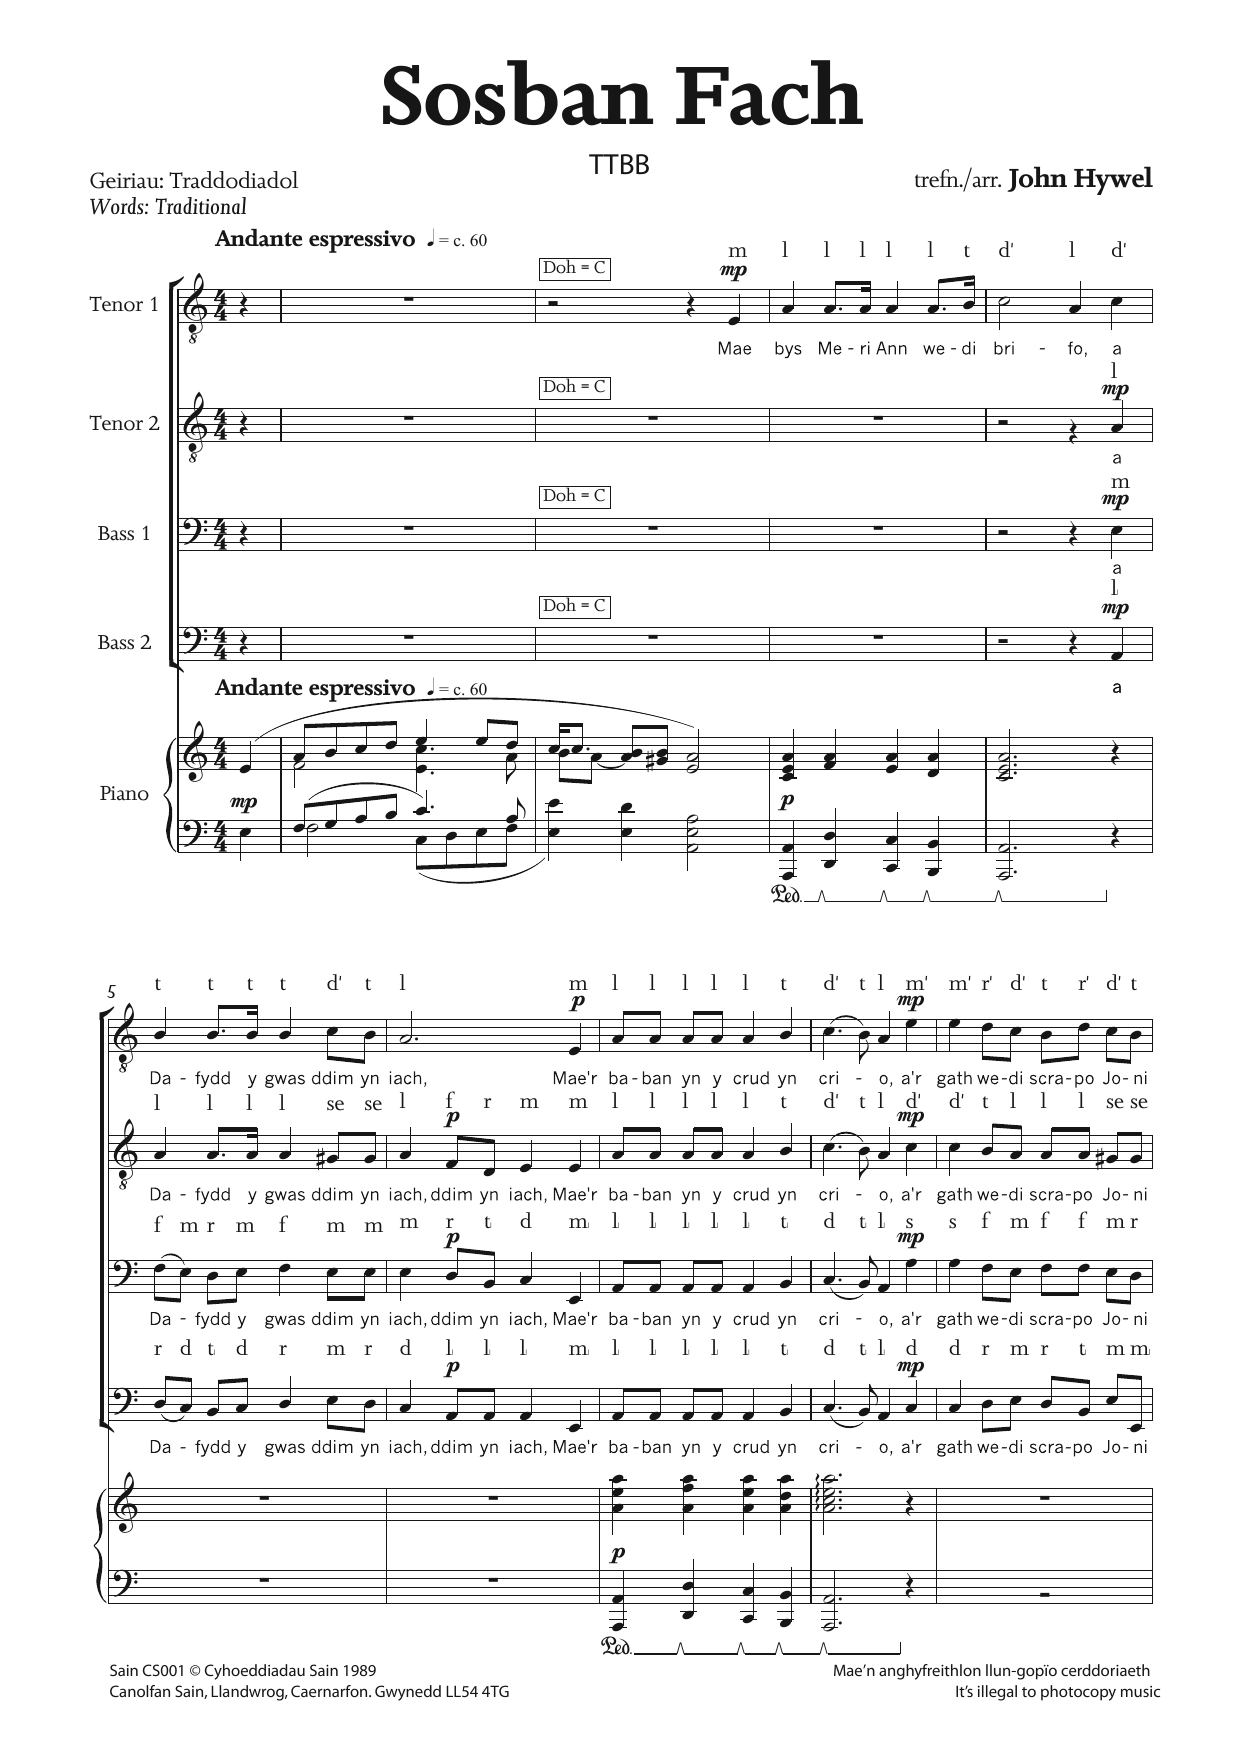 Sosban Fach Sheet Music